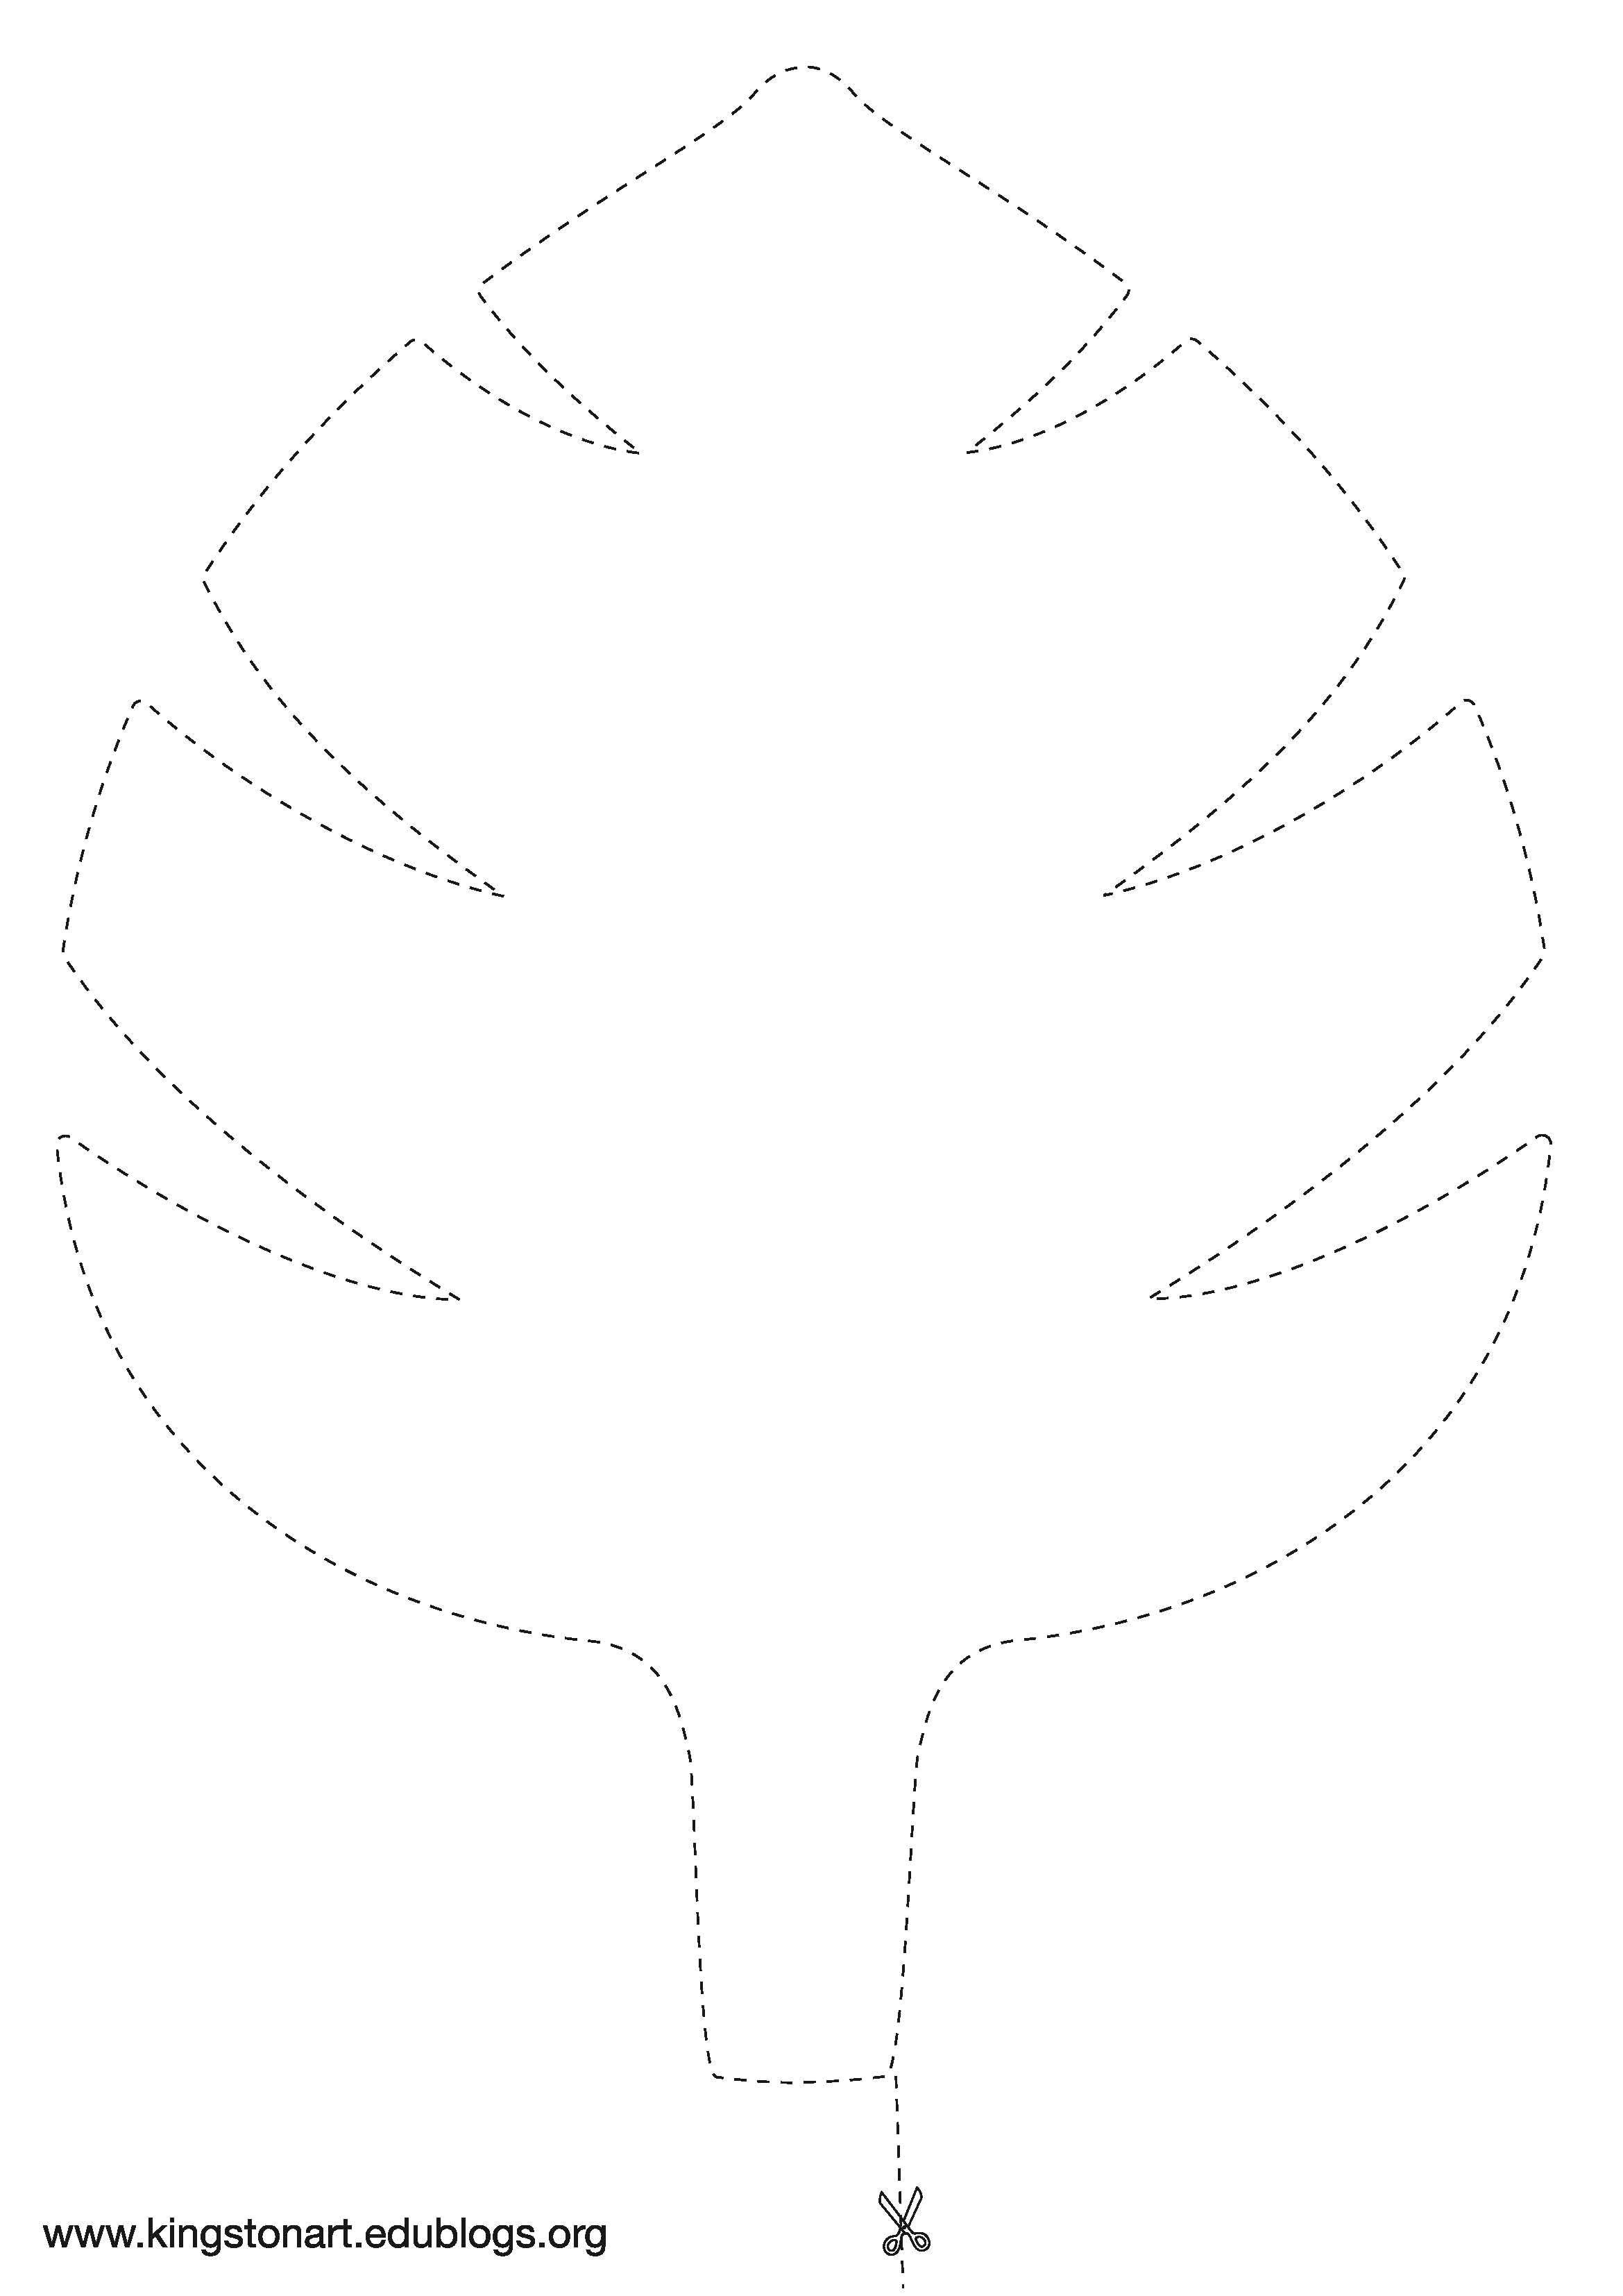 Jungle Leaf Templates to Cut Out Jungle Leaf Template Jungle theme Pinte